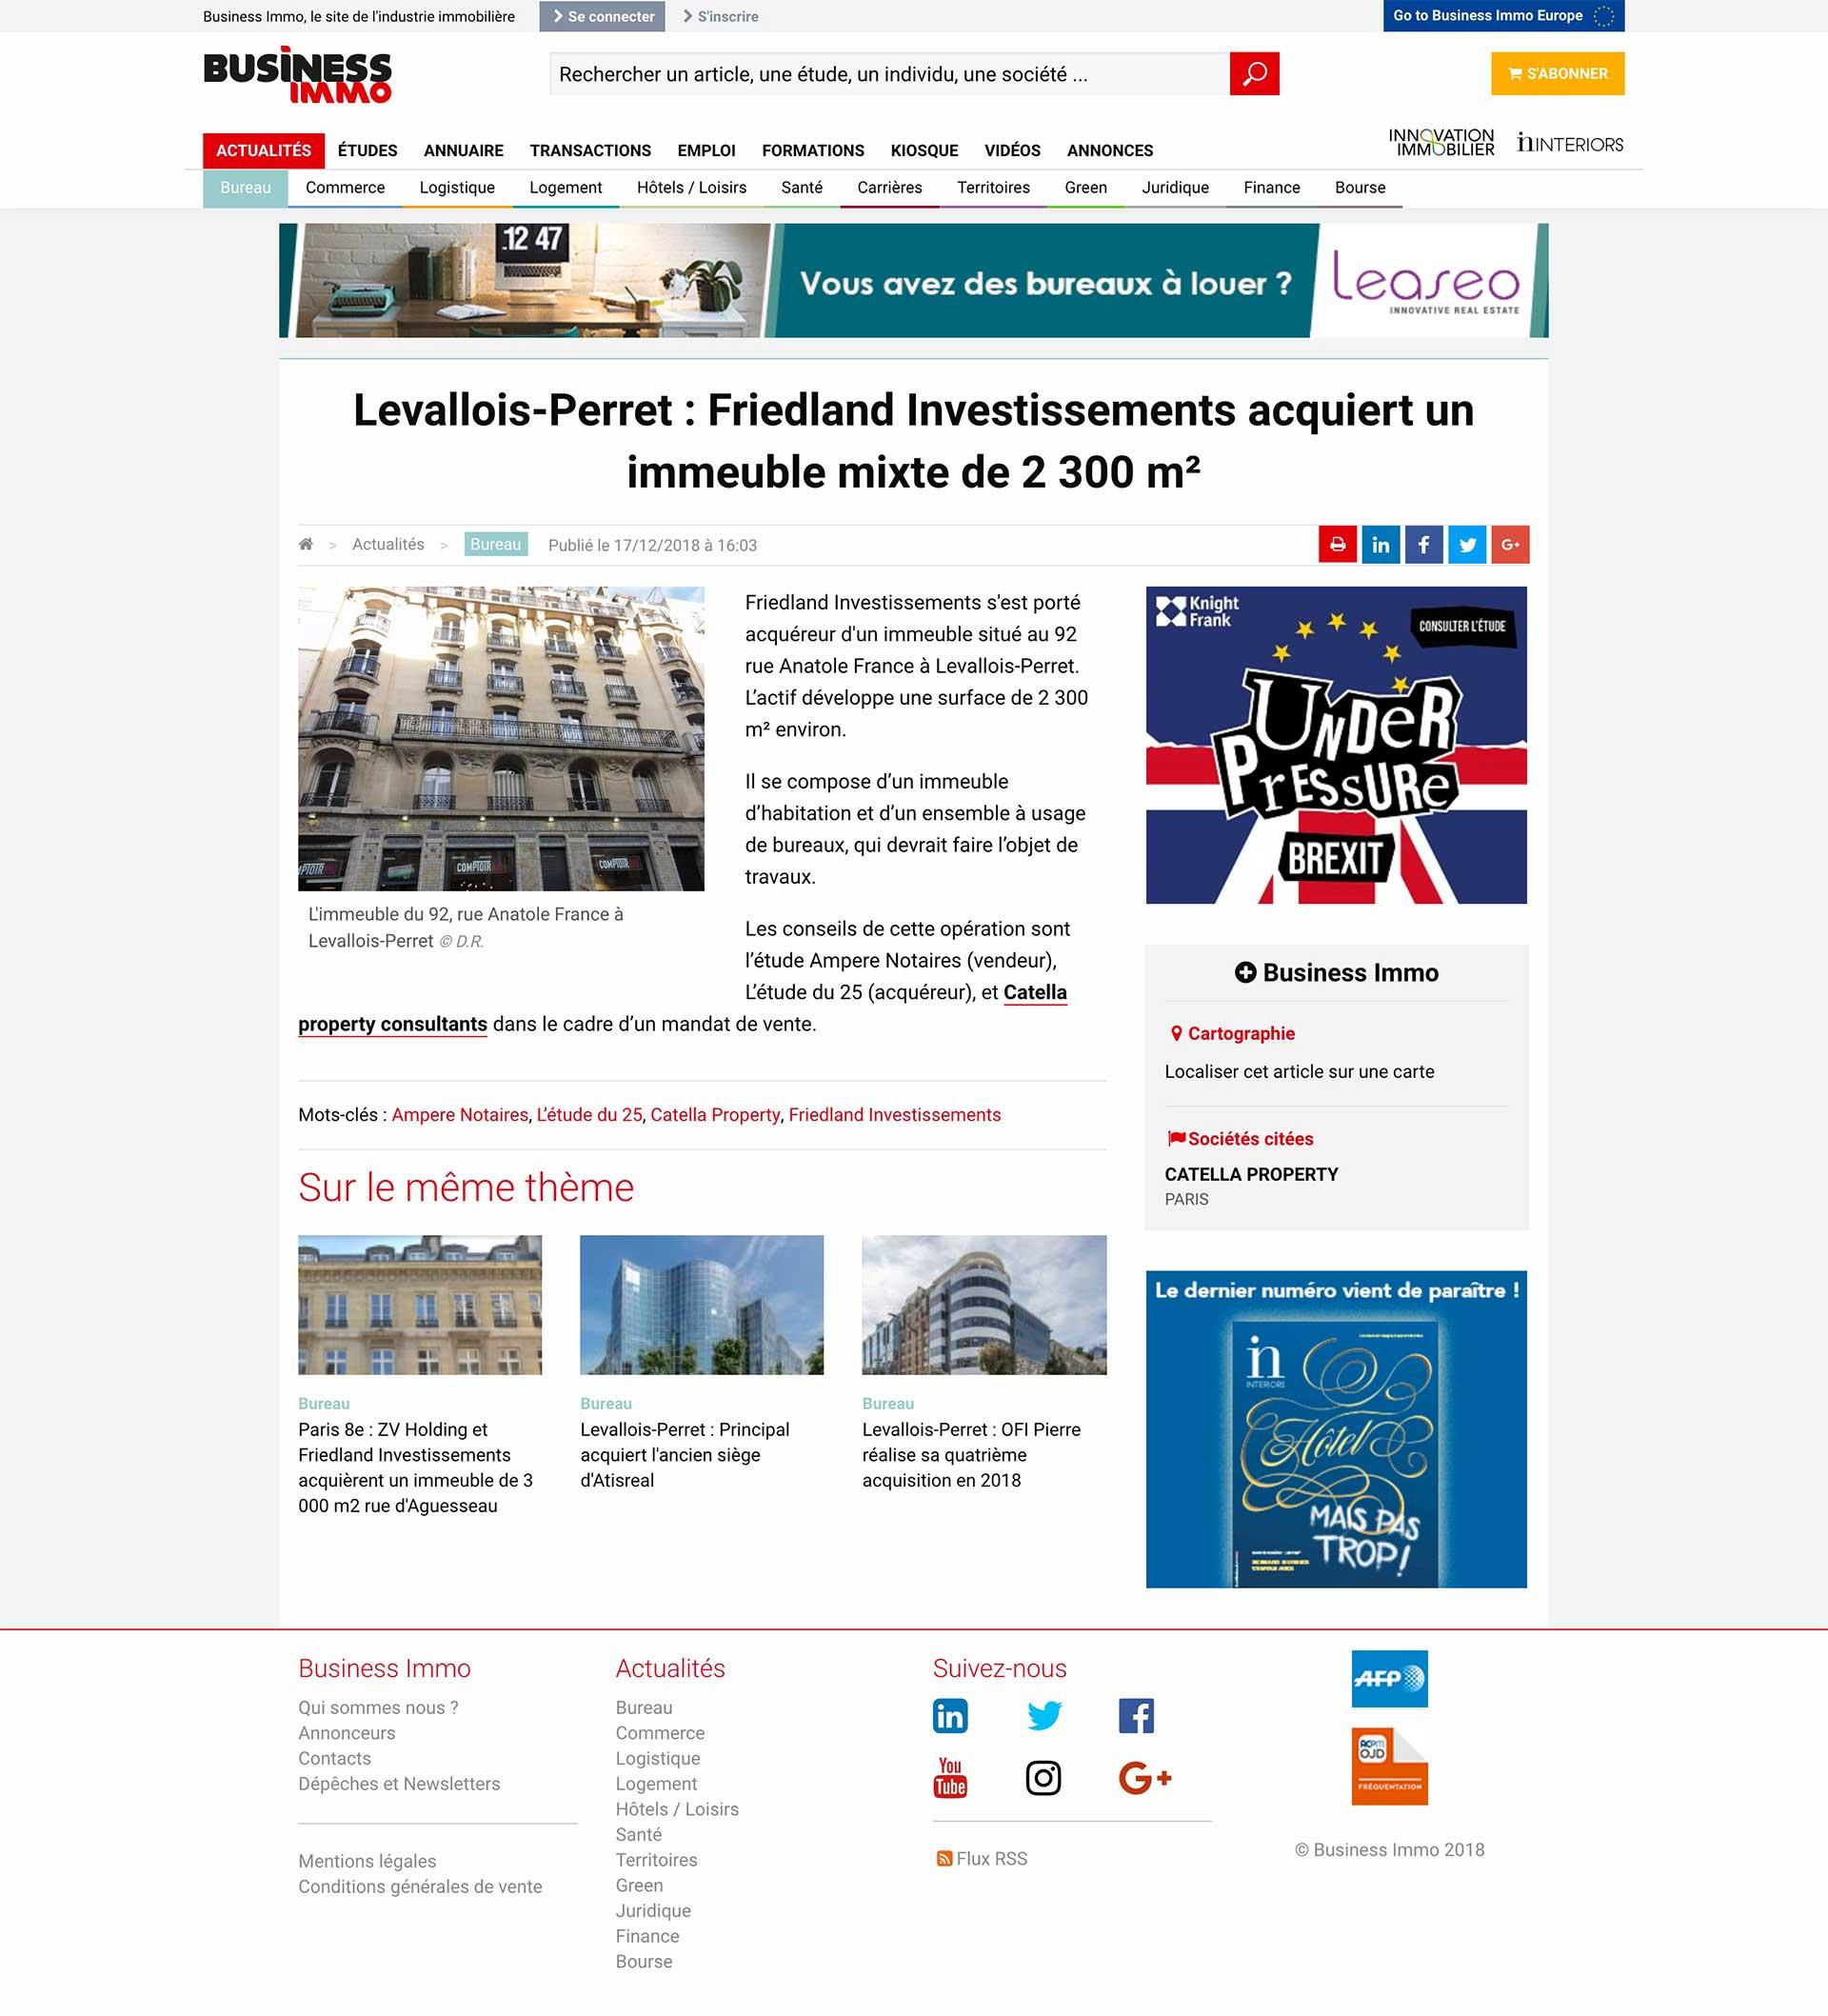 Friedland-Investissements-Levallois-Perret-Friedland Investissements Presse